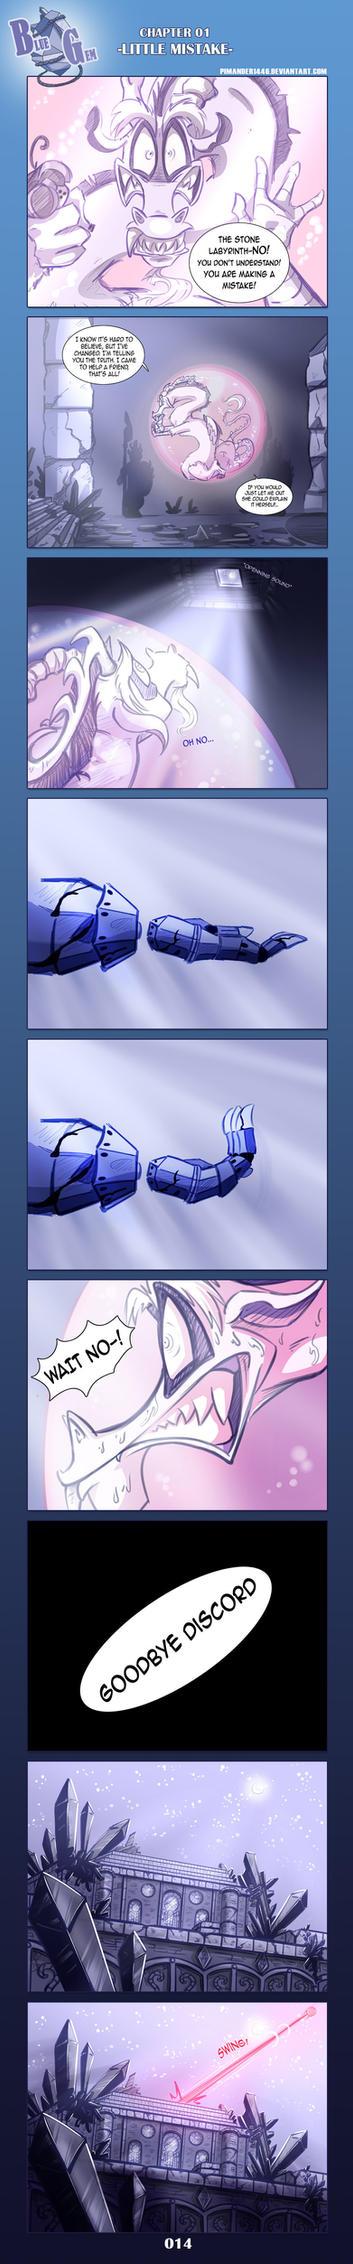 BlueGem COMIC -- Page 014 by Pimander1446